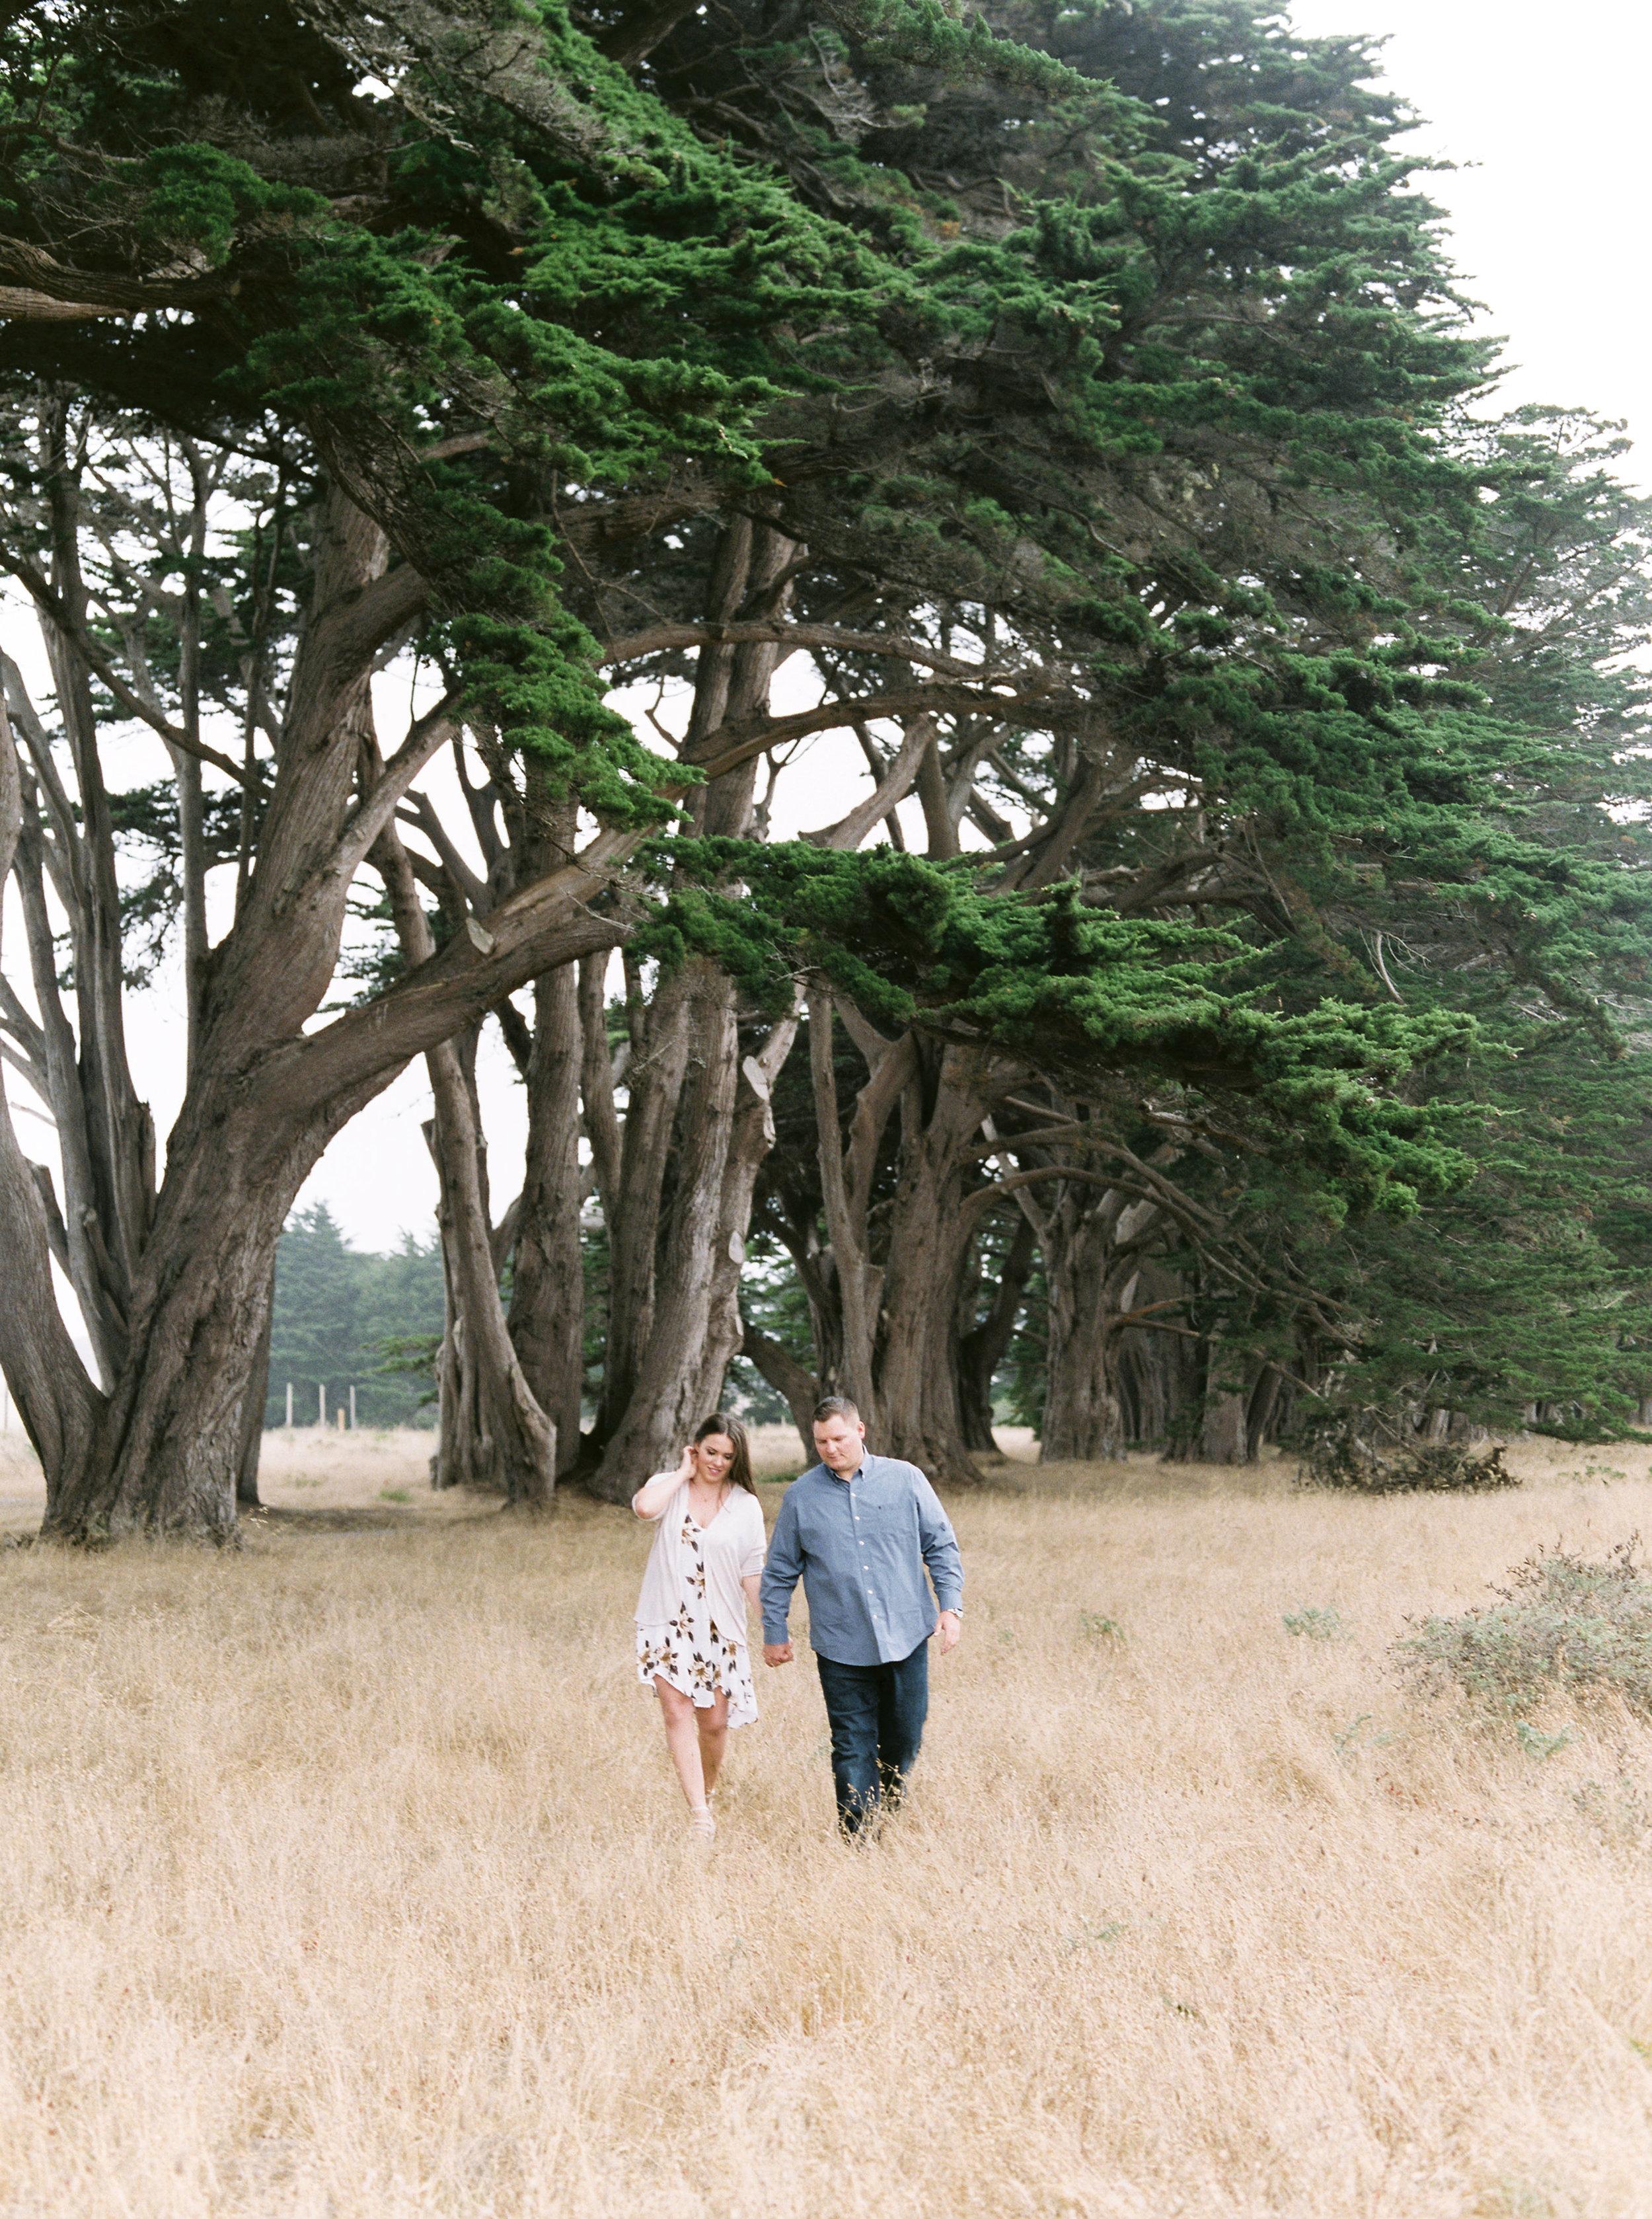 Point-reyes-california-engagement-photographer-45.jpg